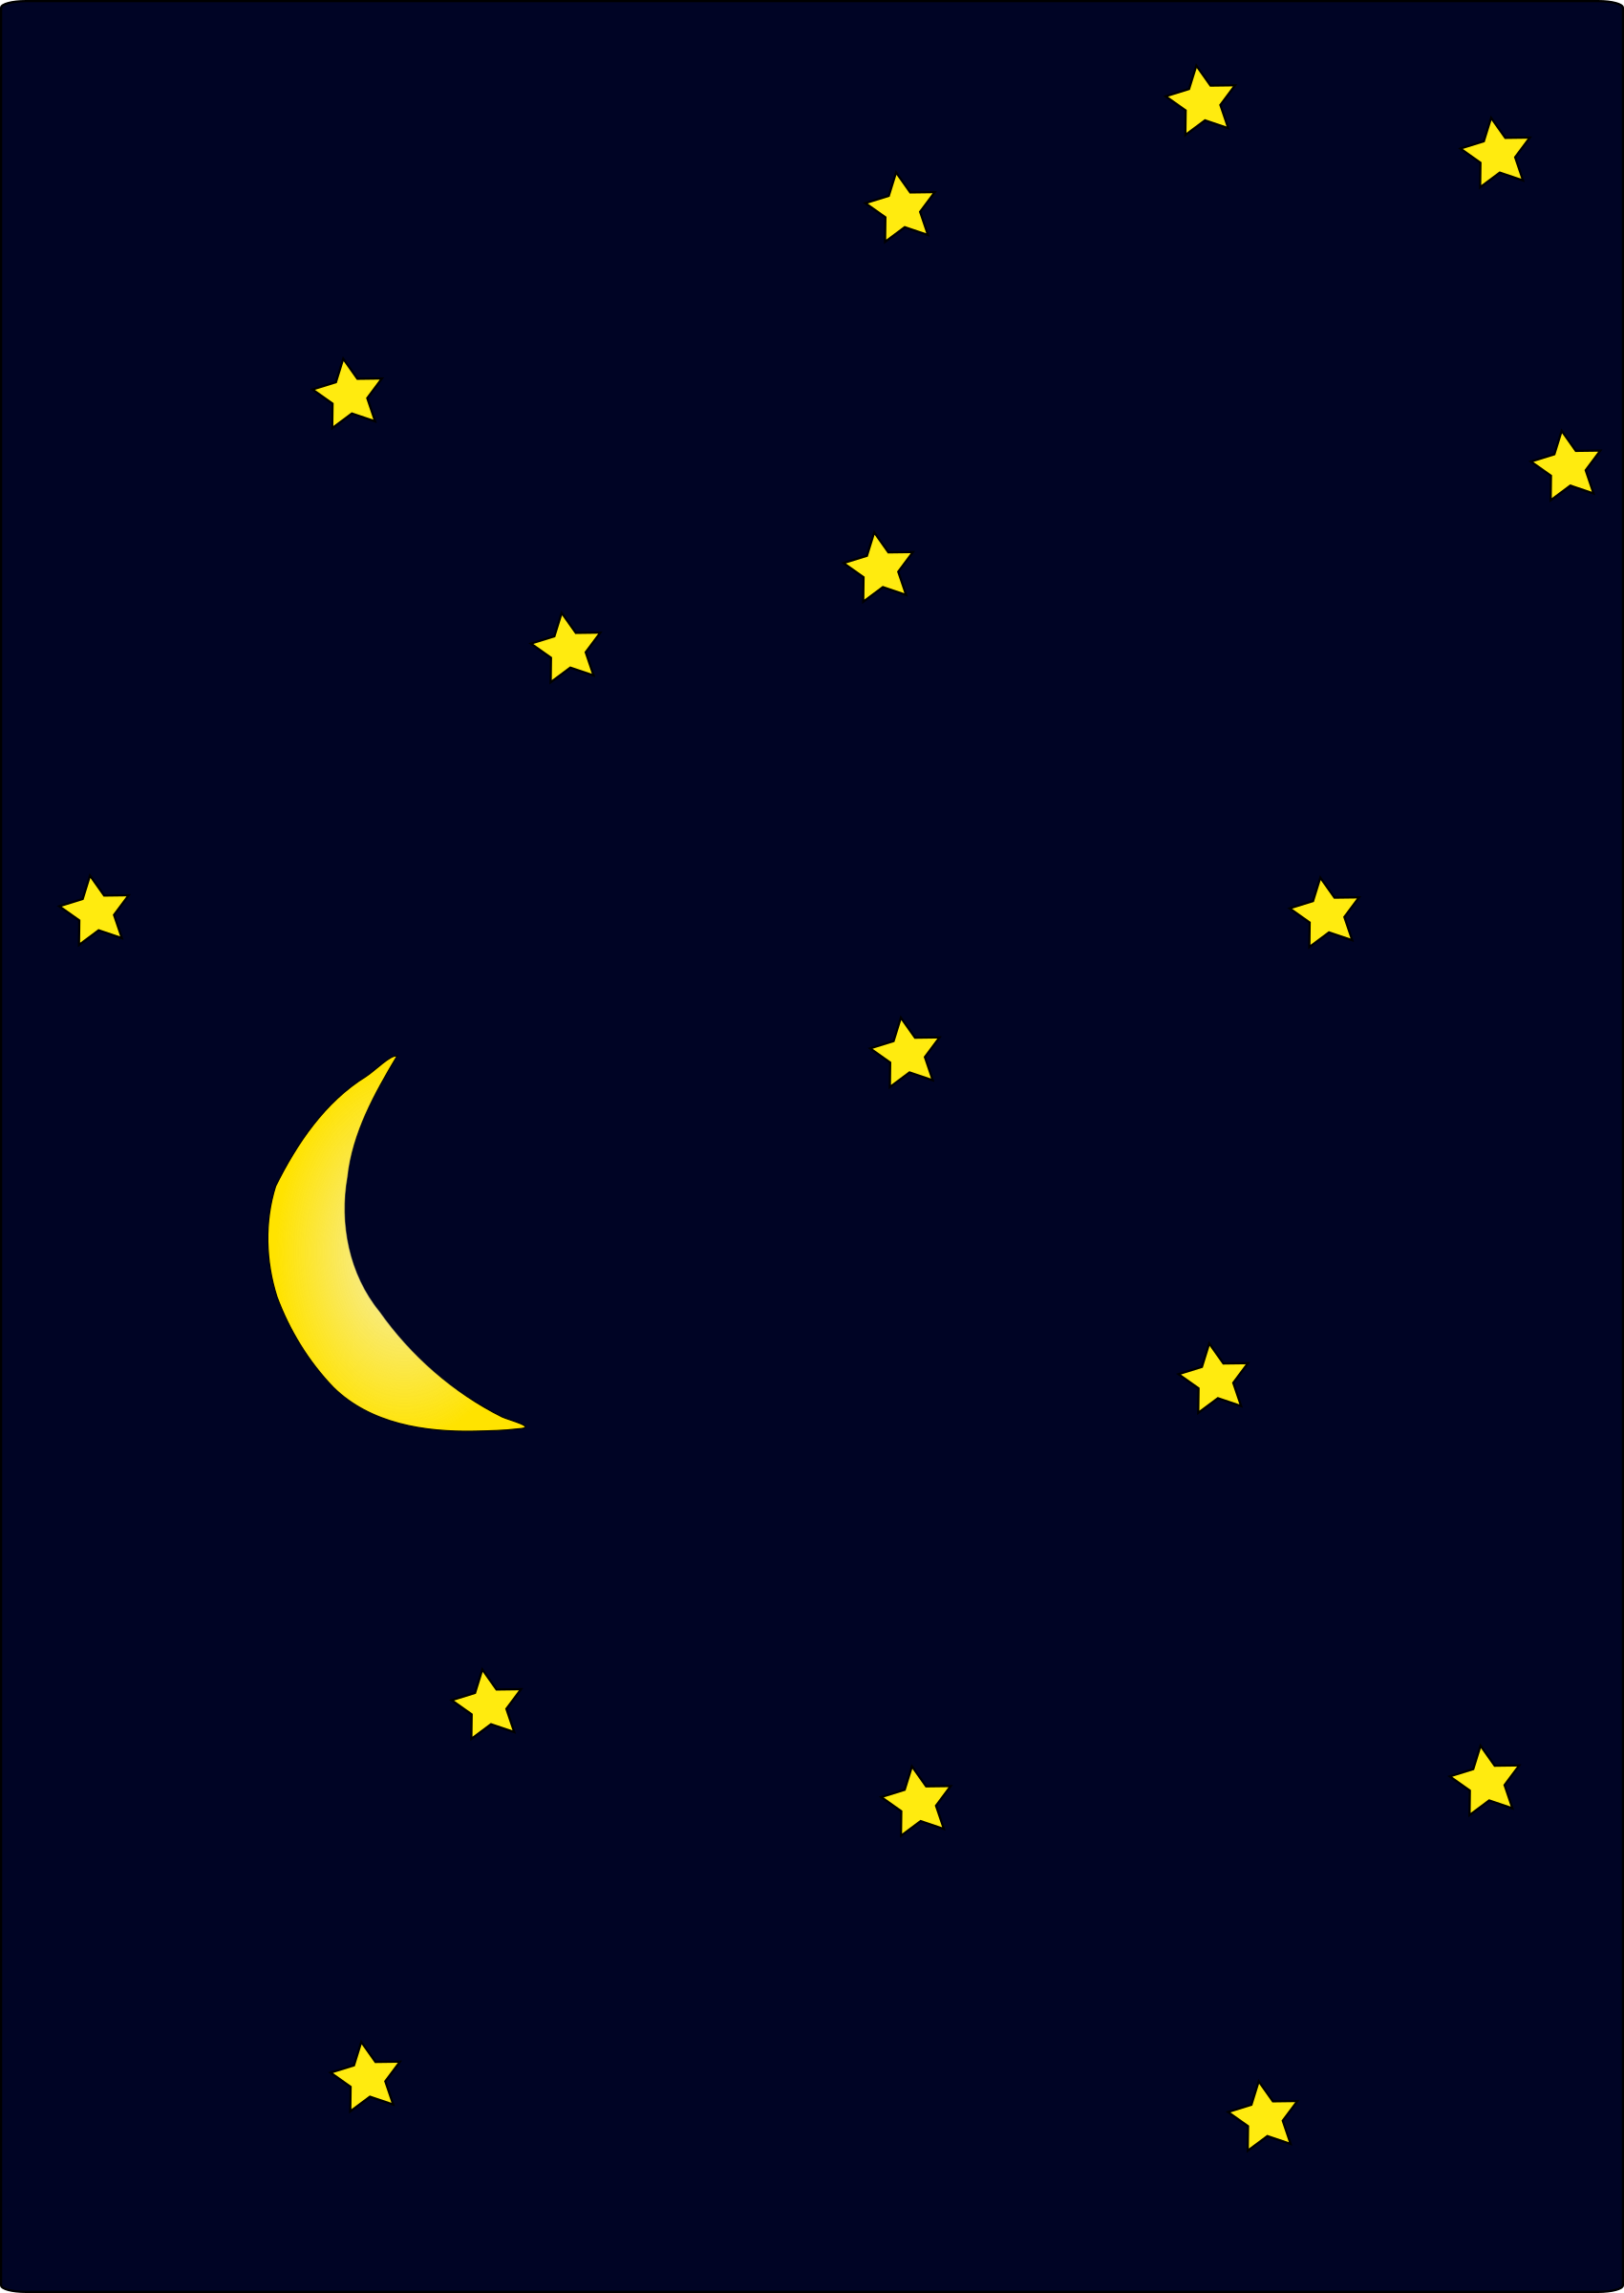 Moon In Dark Night Sky Full Of Stars